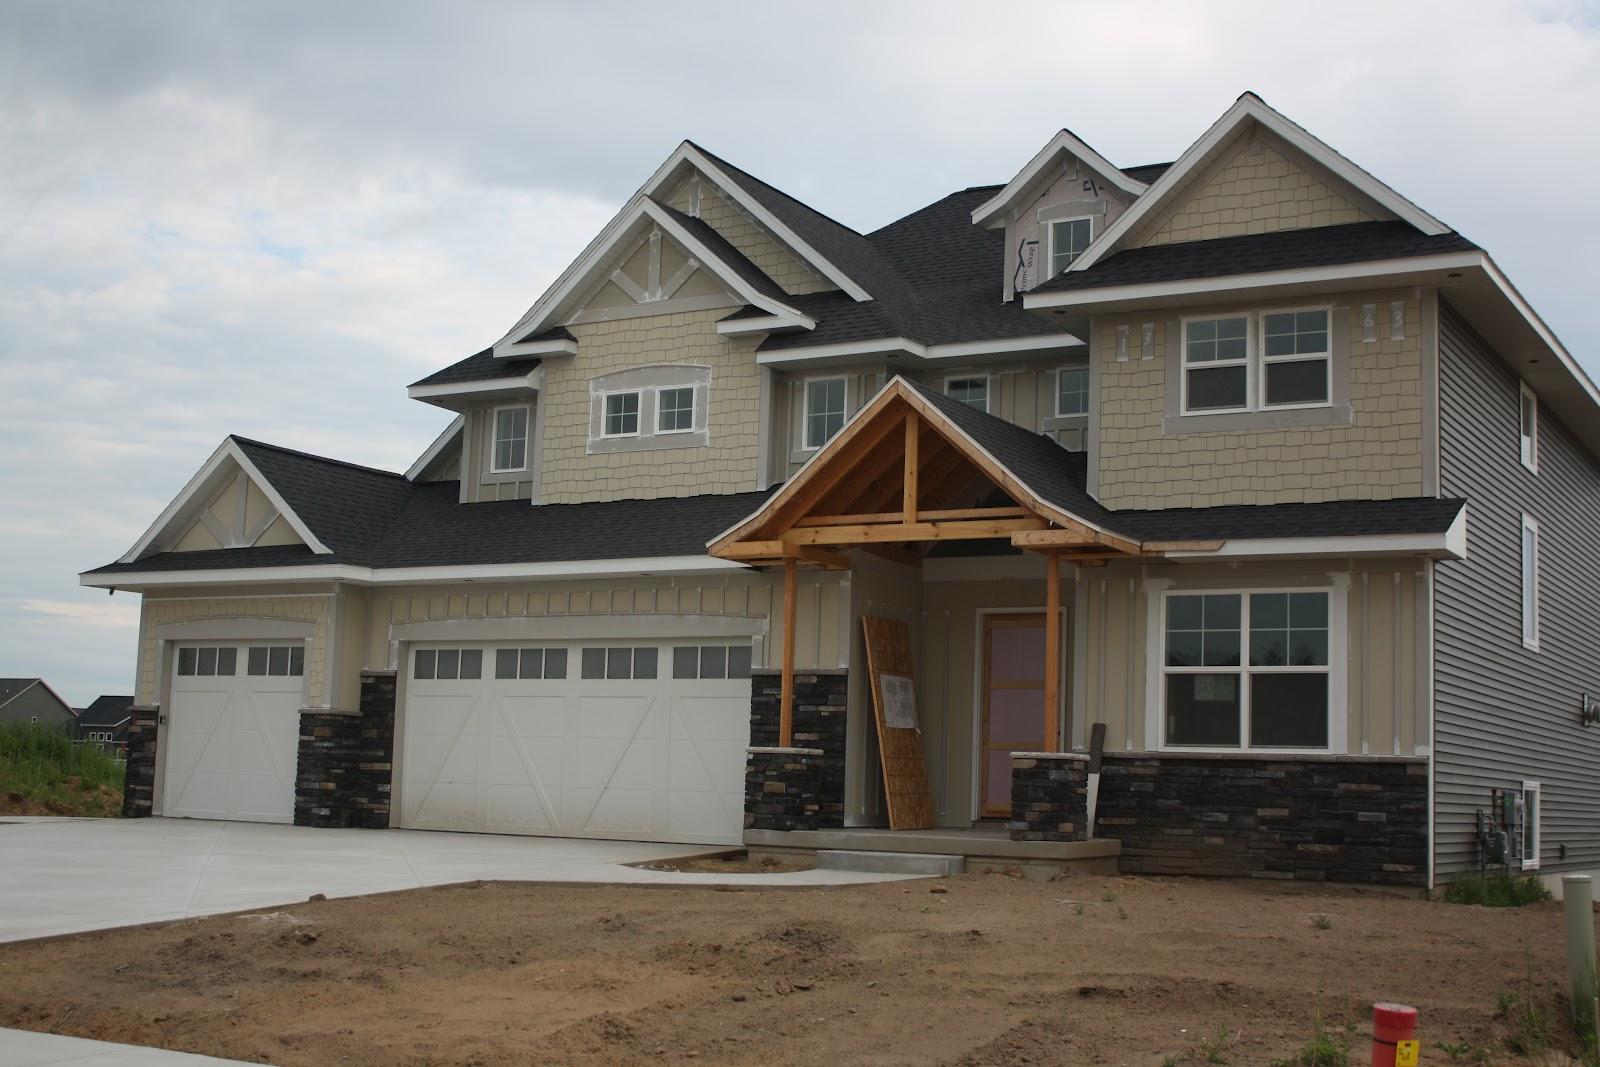 House On Tufton: The Build: Exterior Stone, Siding, And